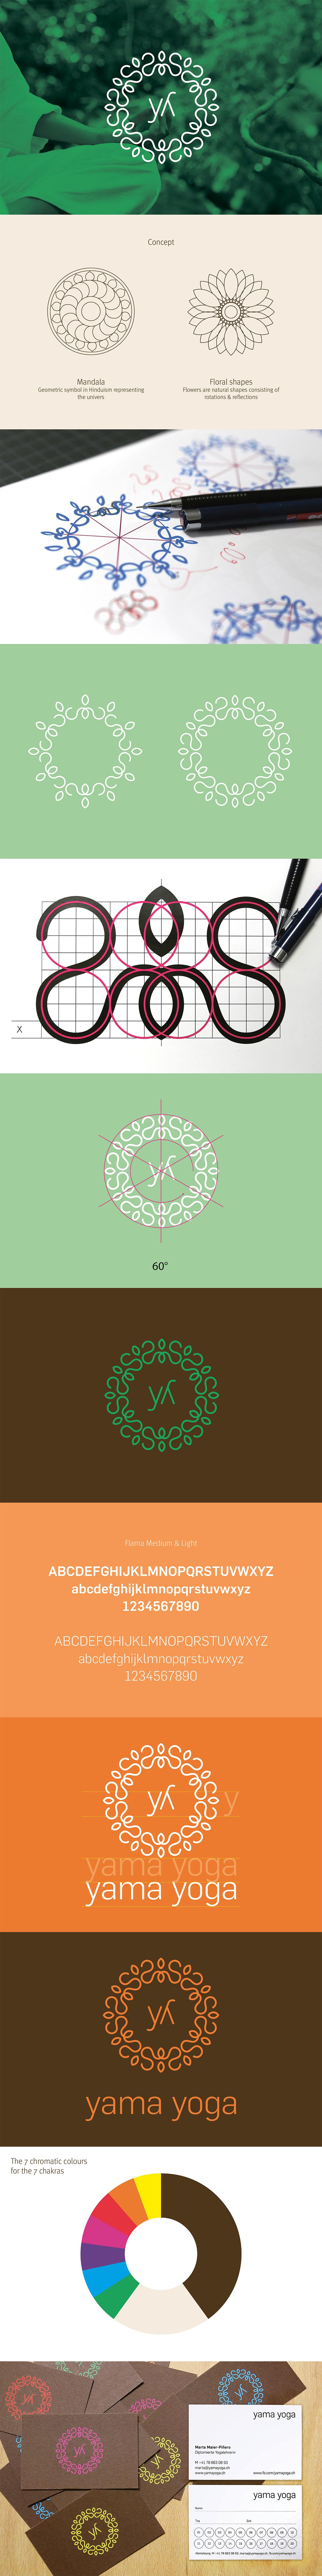 Yoga yama logo brand meditation calm floral shape Mandala corporate studio chakra color adicto swiss